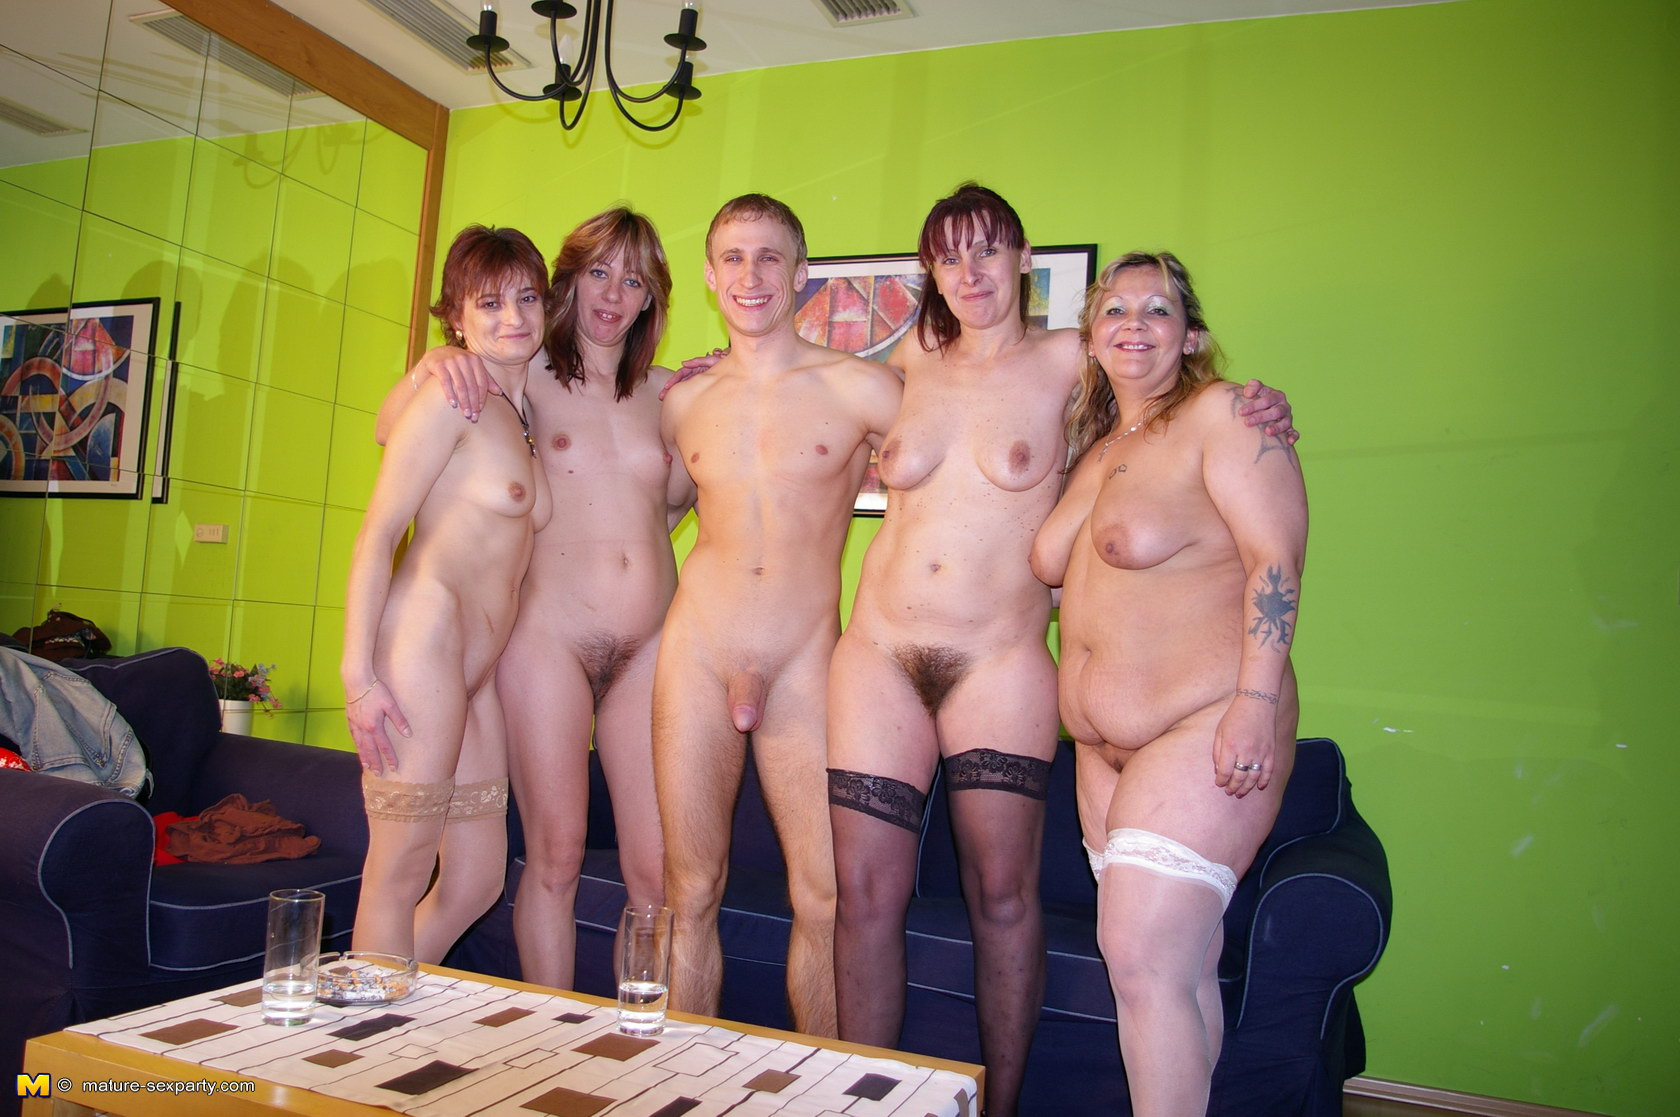 Тети самки порно 9 фотография